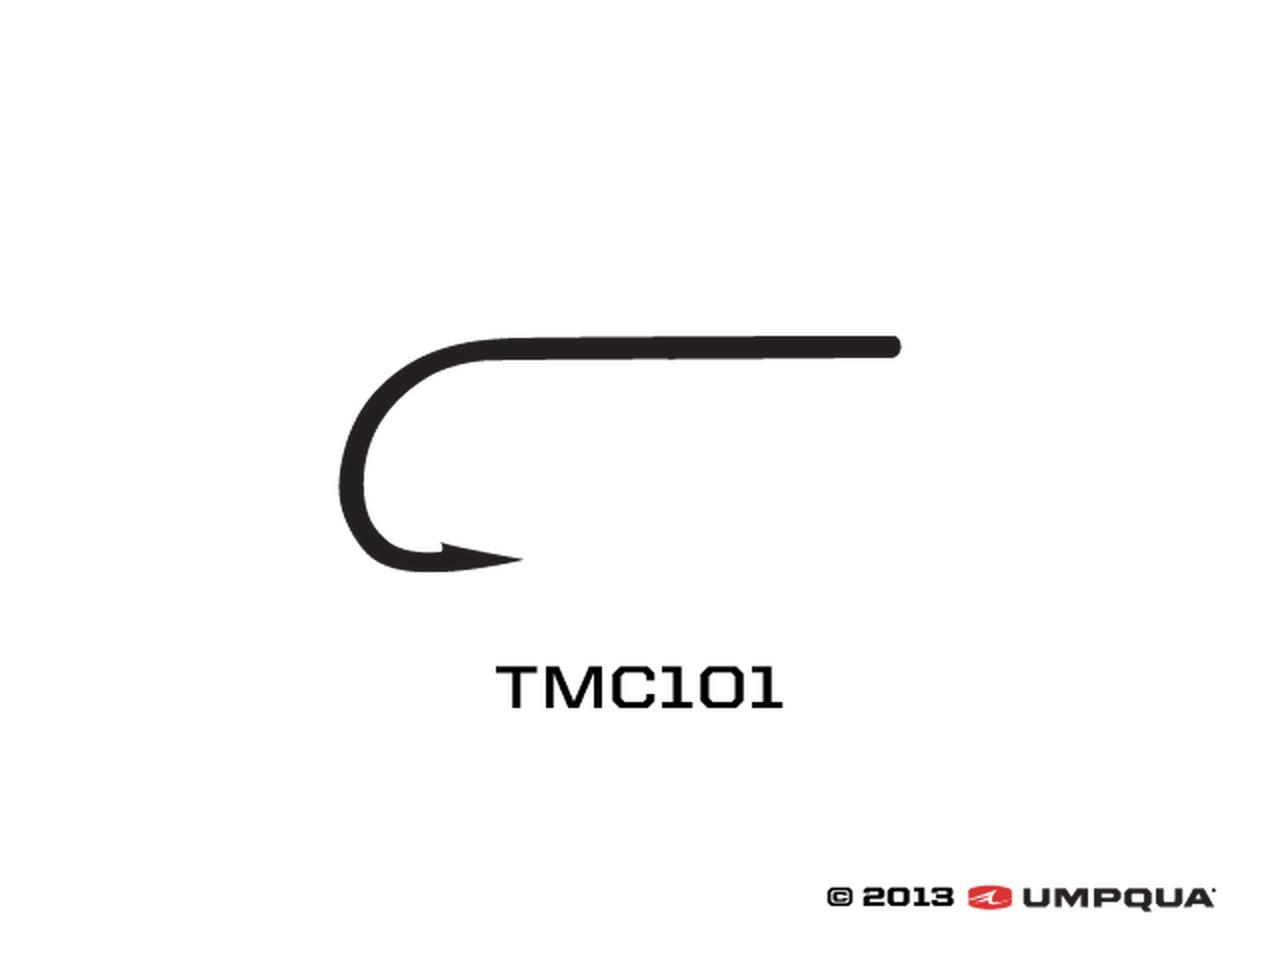 Tiemco TMC 101